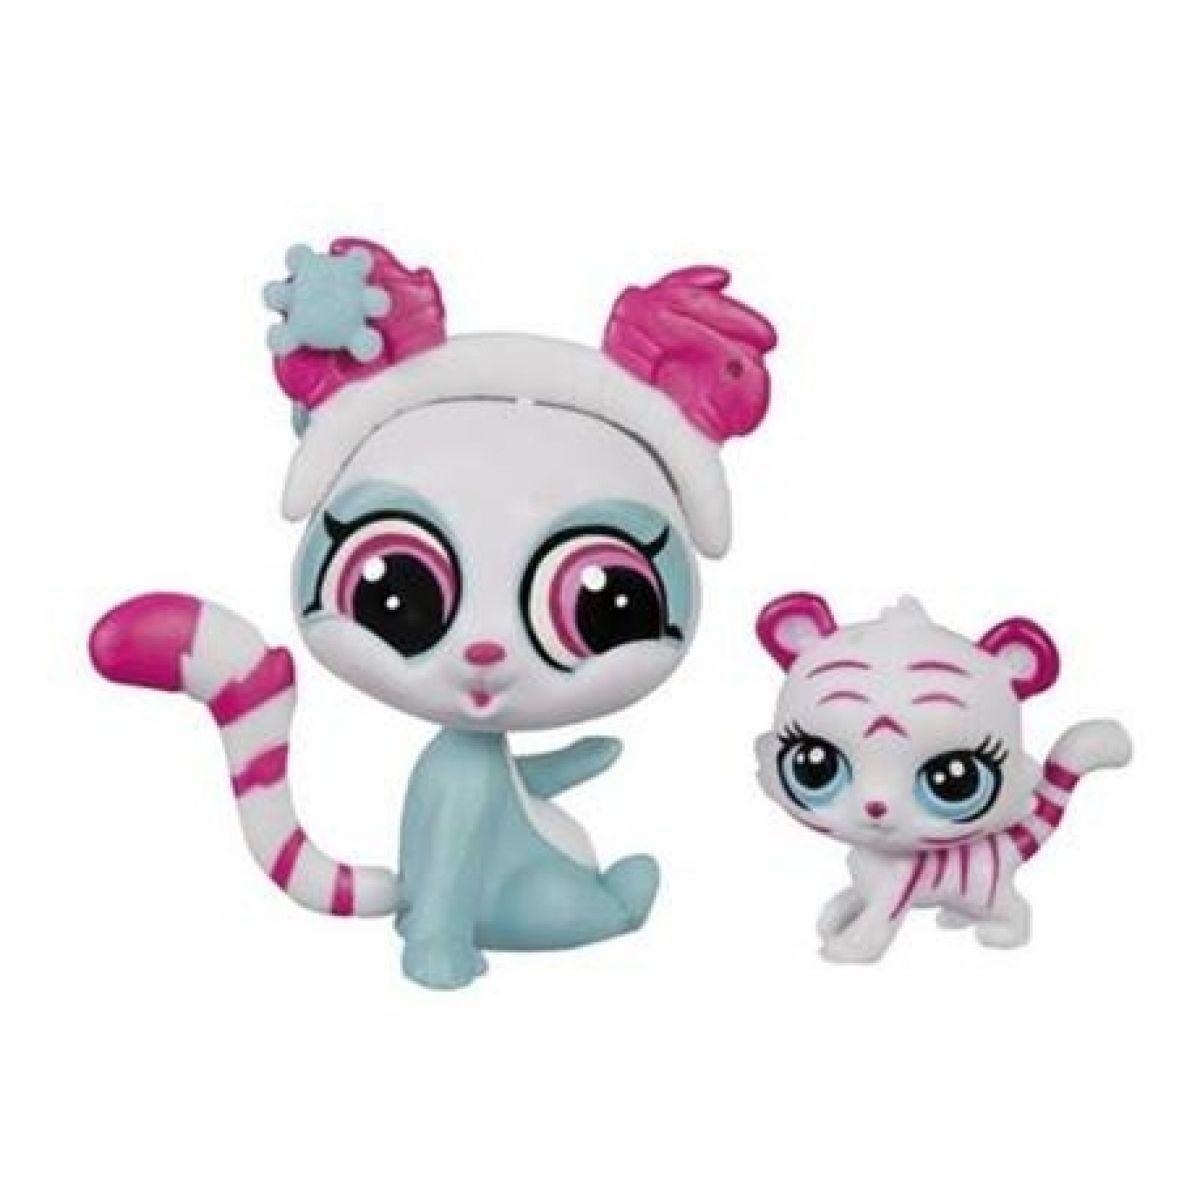 Littlest Pet Shop Maminka s miminkem - A9395 Panda a tygr